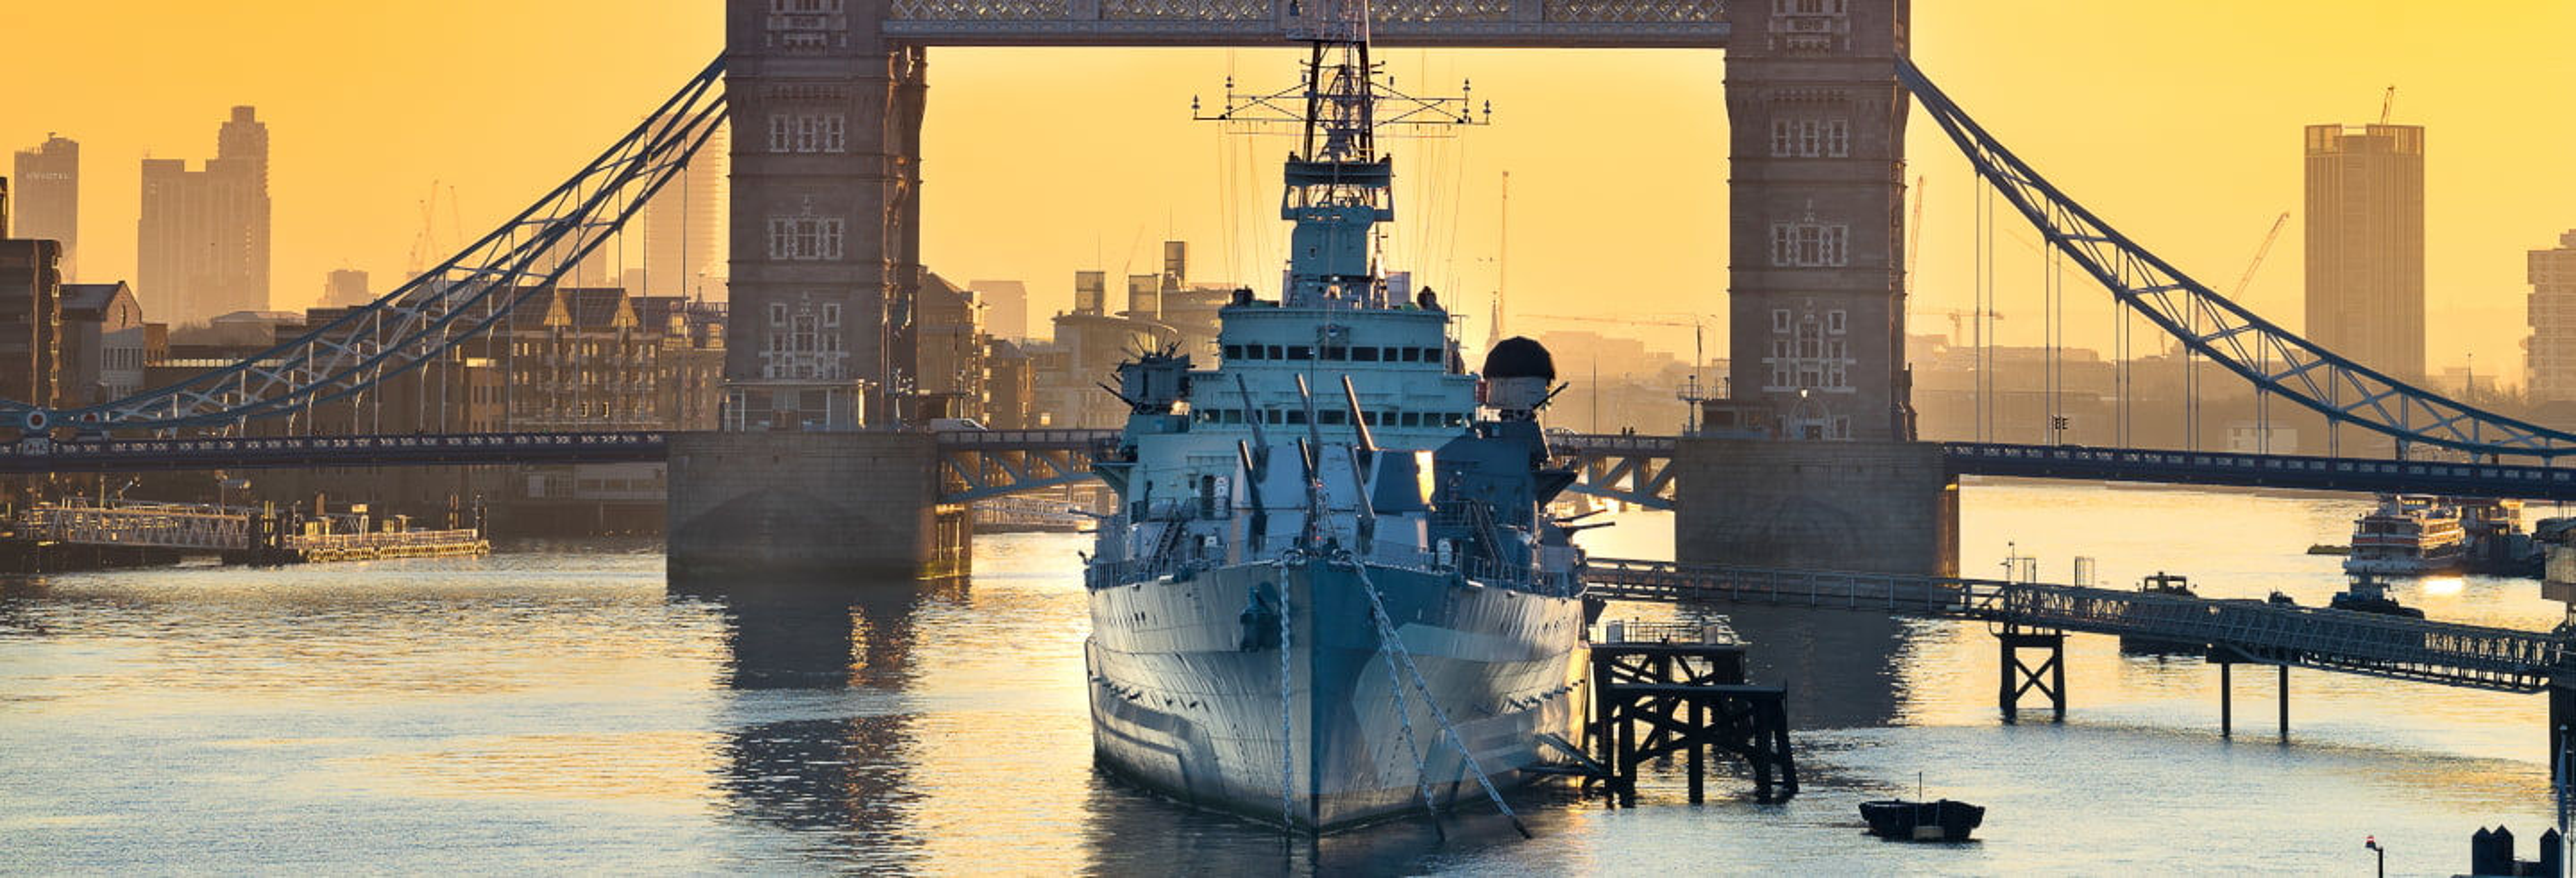 Entrada al HMS Belfast